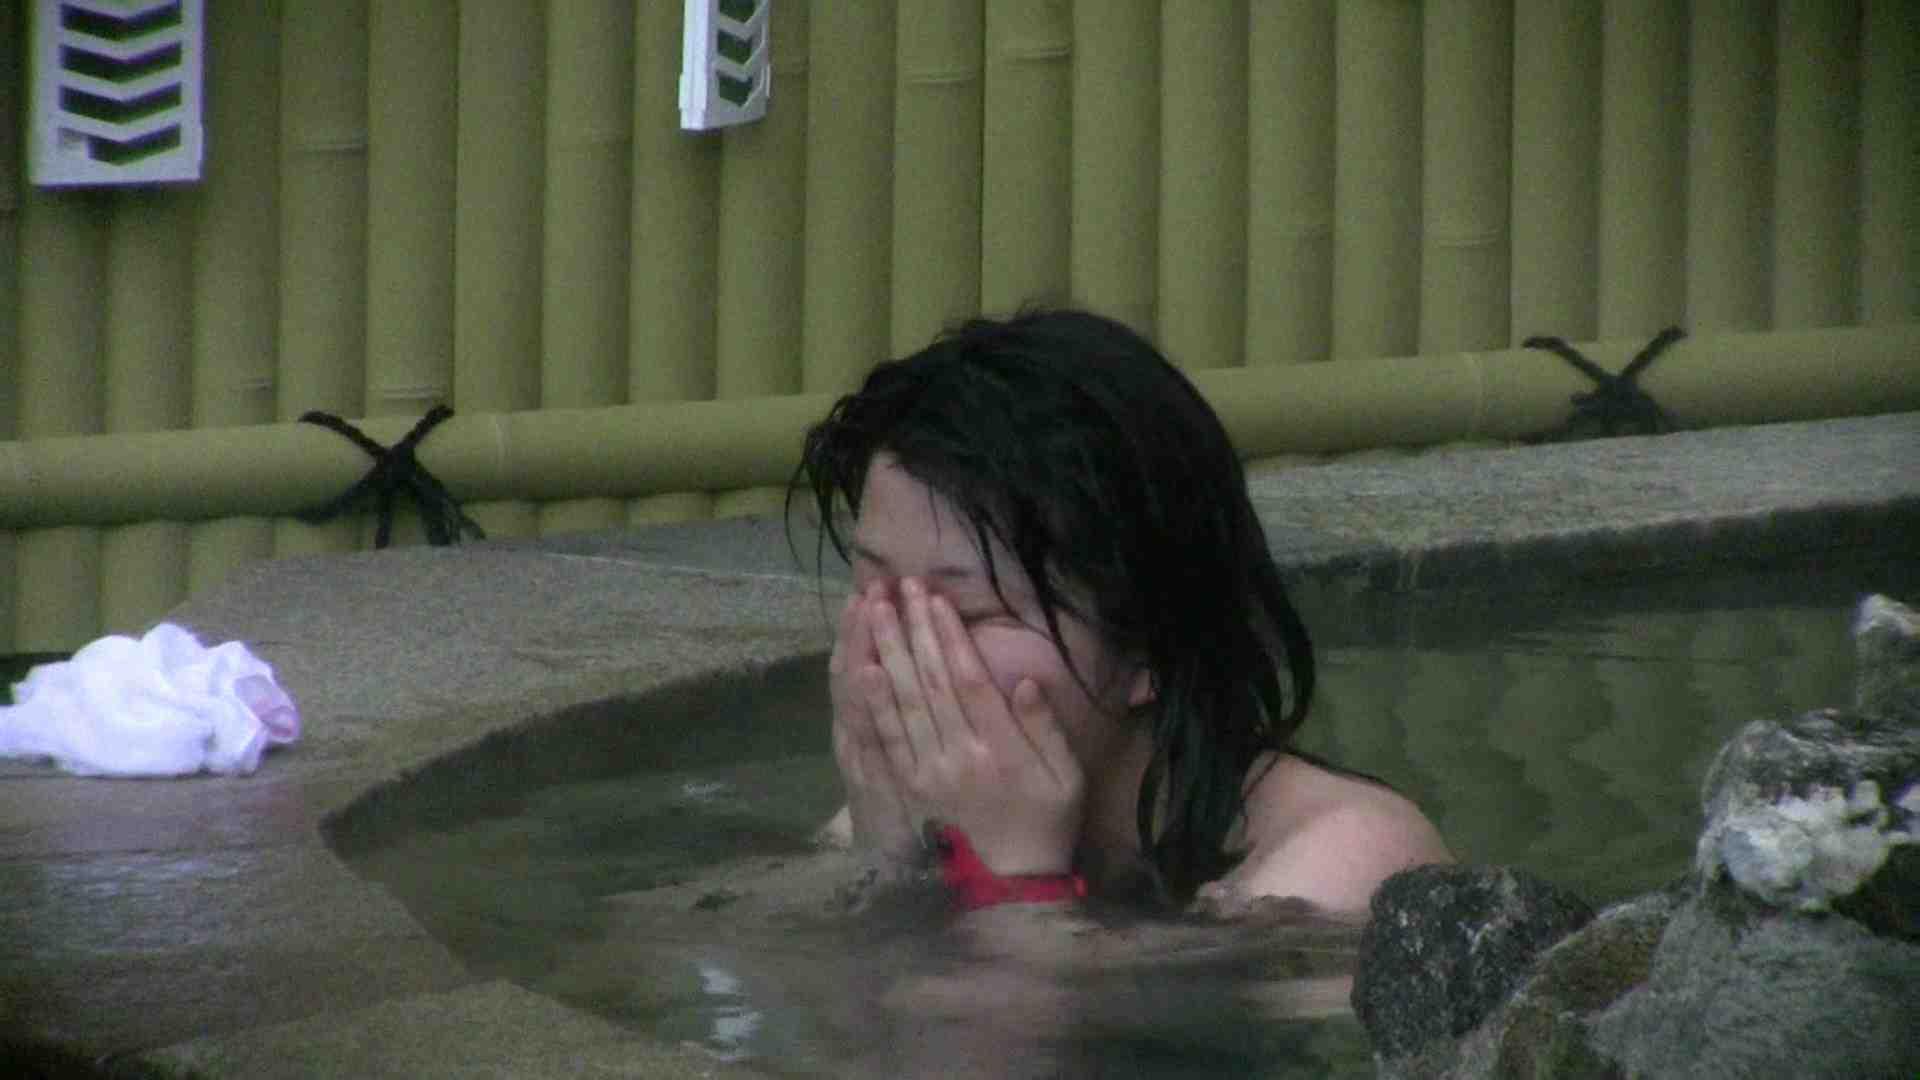 Aquaな露天風呂Vol.541 露天風呂編 | 盗撮シリーズ  88PIX 11